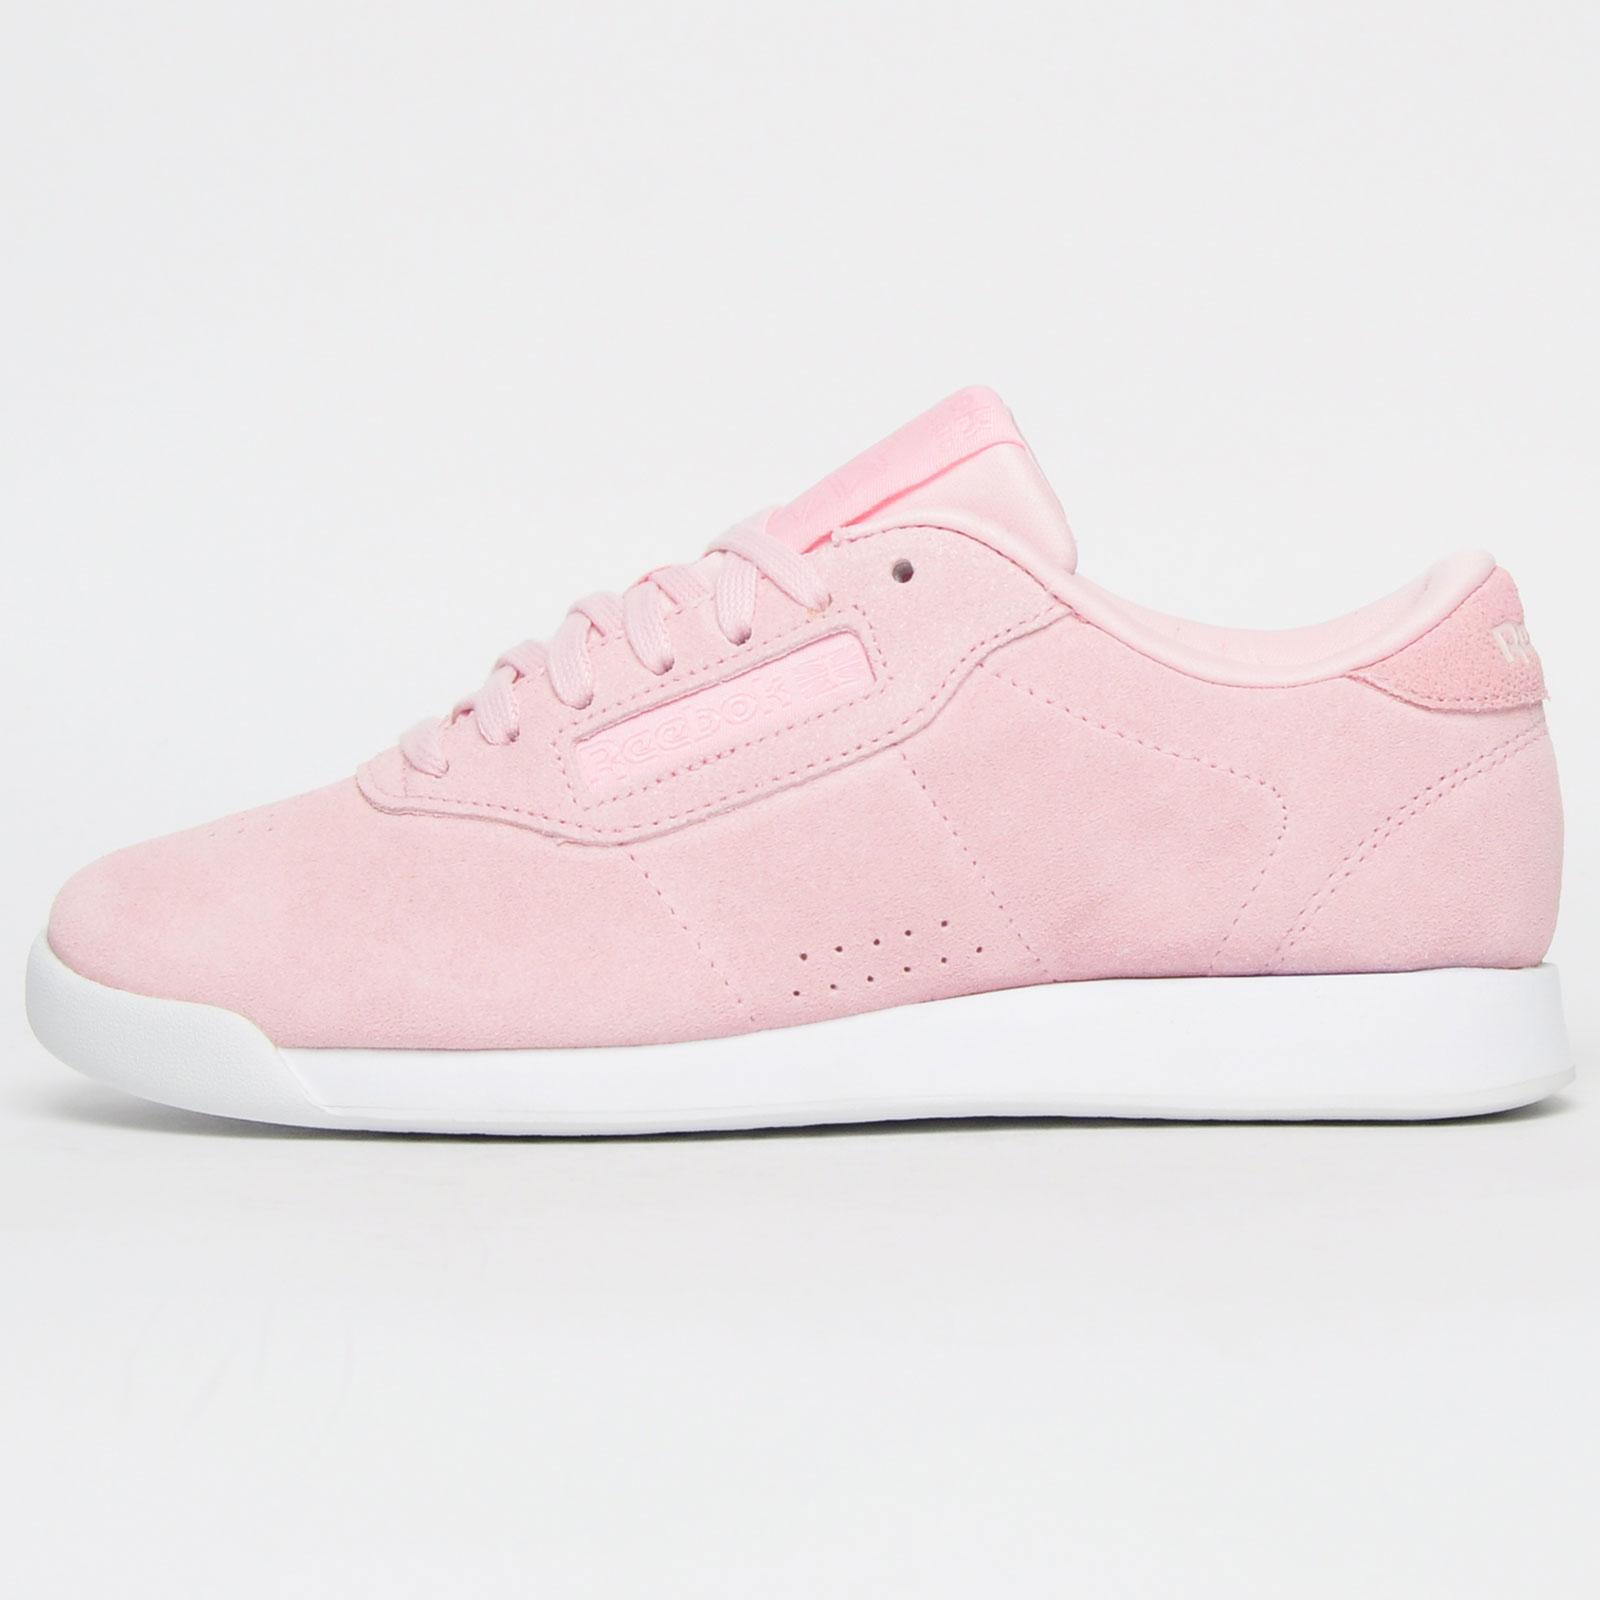 cohete Irradiar Reposición  Reebok Classic Princess Suede Leather Women's Girls Casual Retro Trainers  Pink | eBay